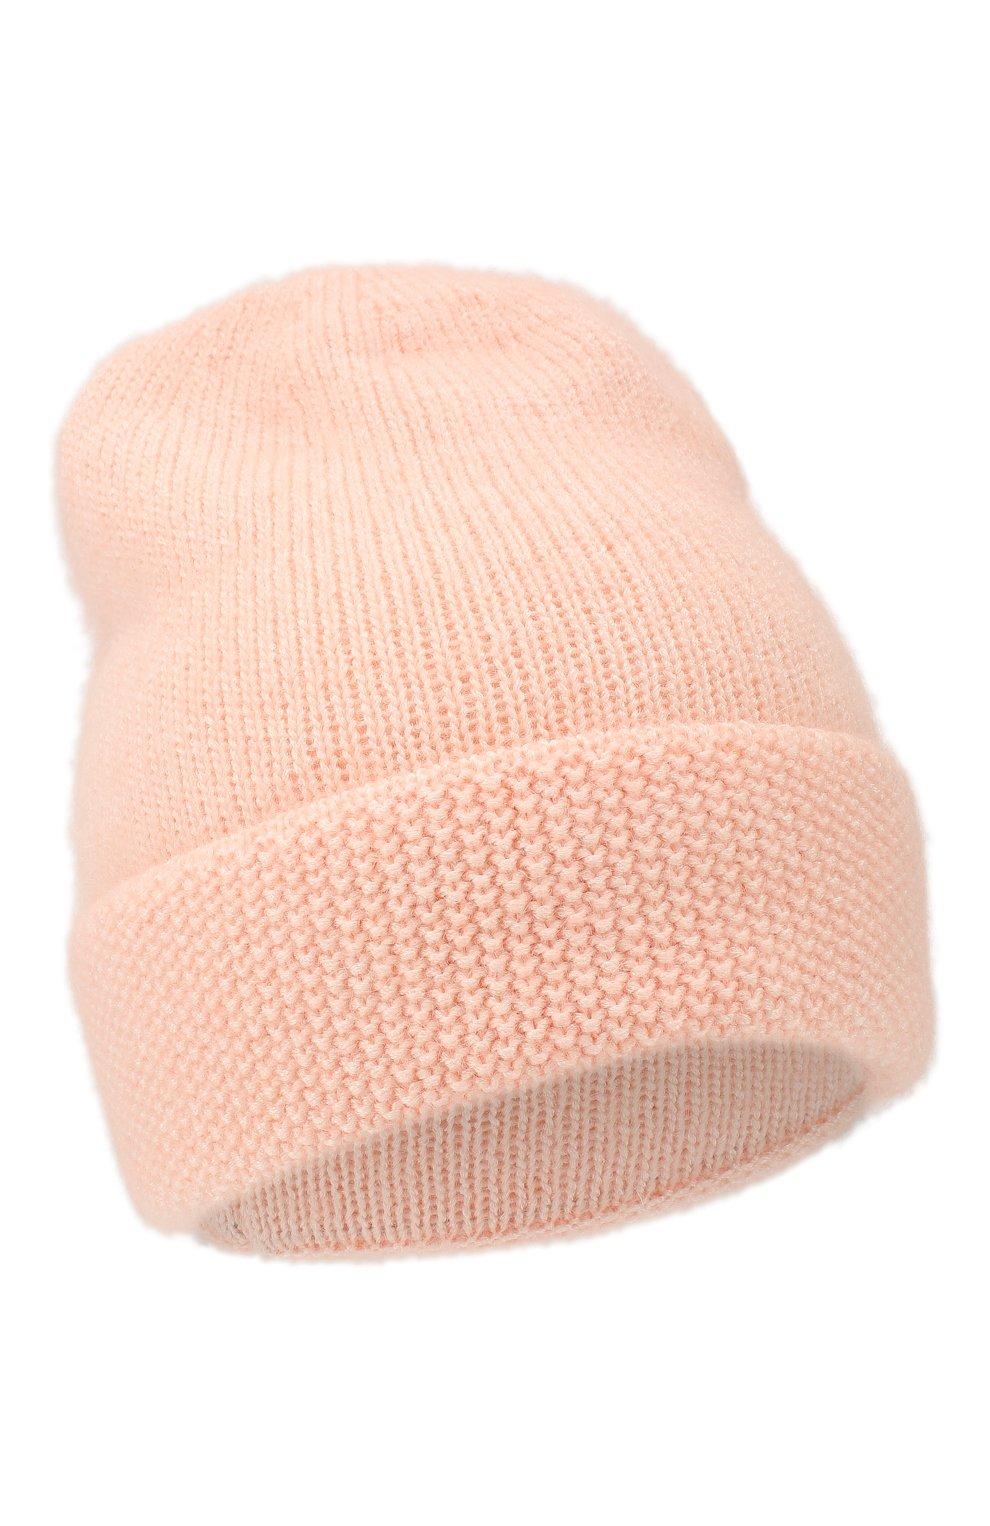 Женская шапка odette CANOE светло-розового цвета, арт. 4918466   Фото 1